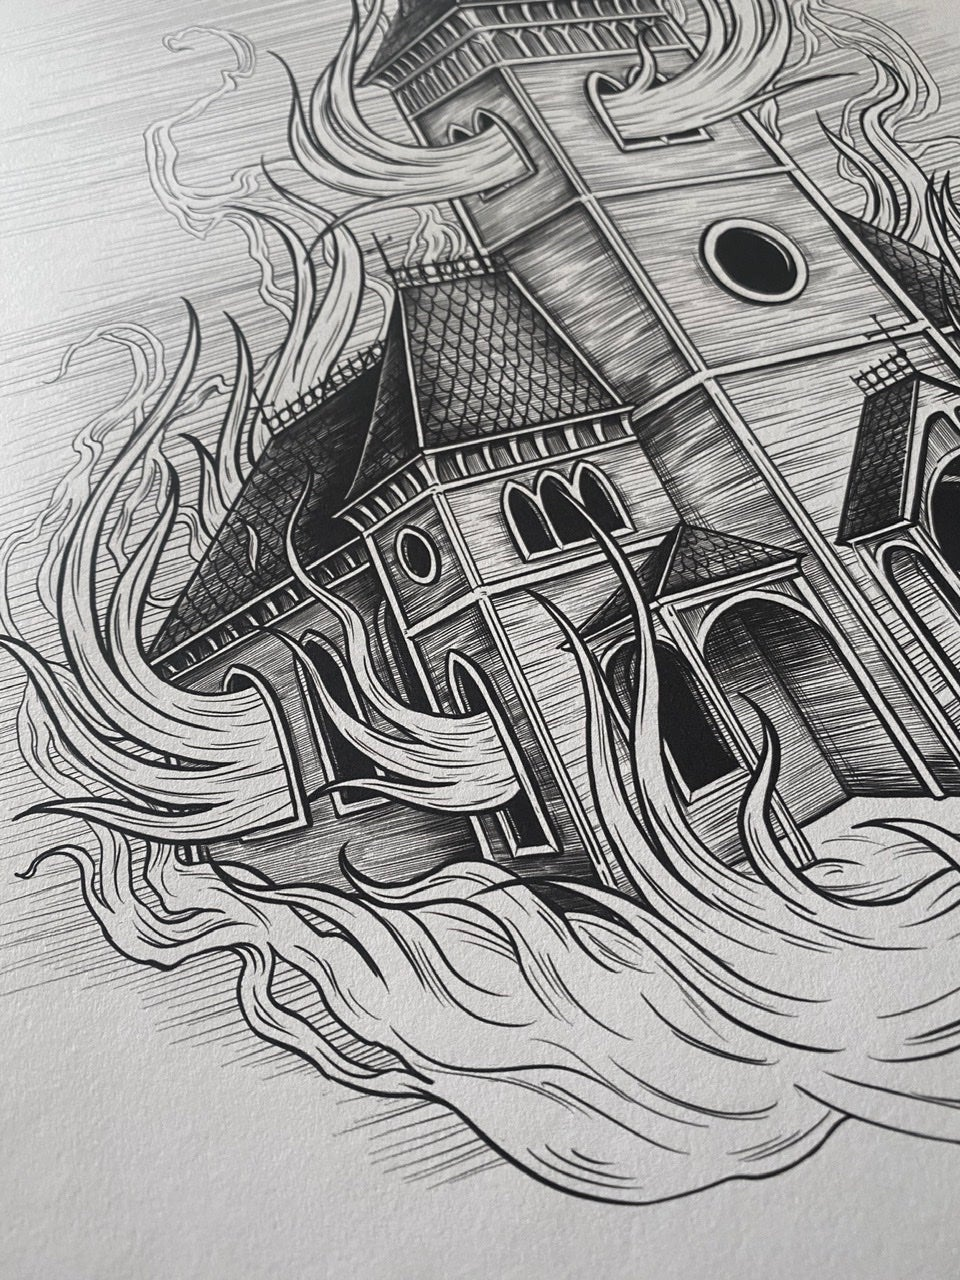 BURNING CHURCH - A3 PRINT LIMITED EDITION